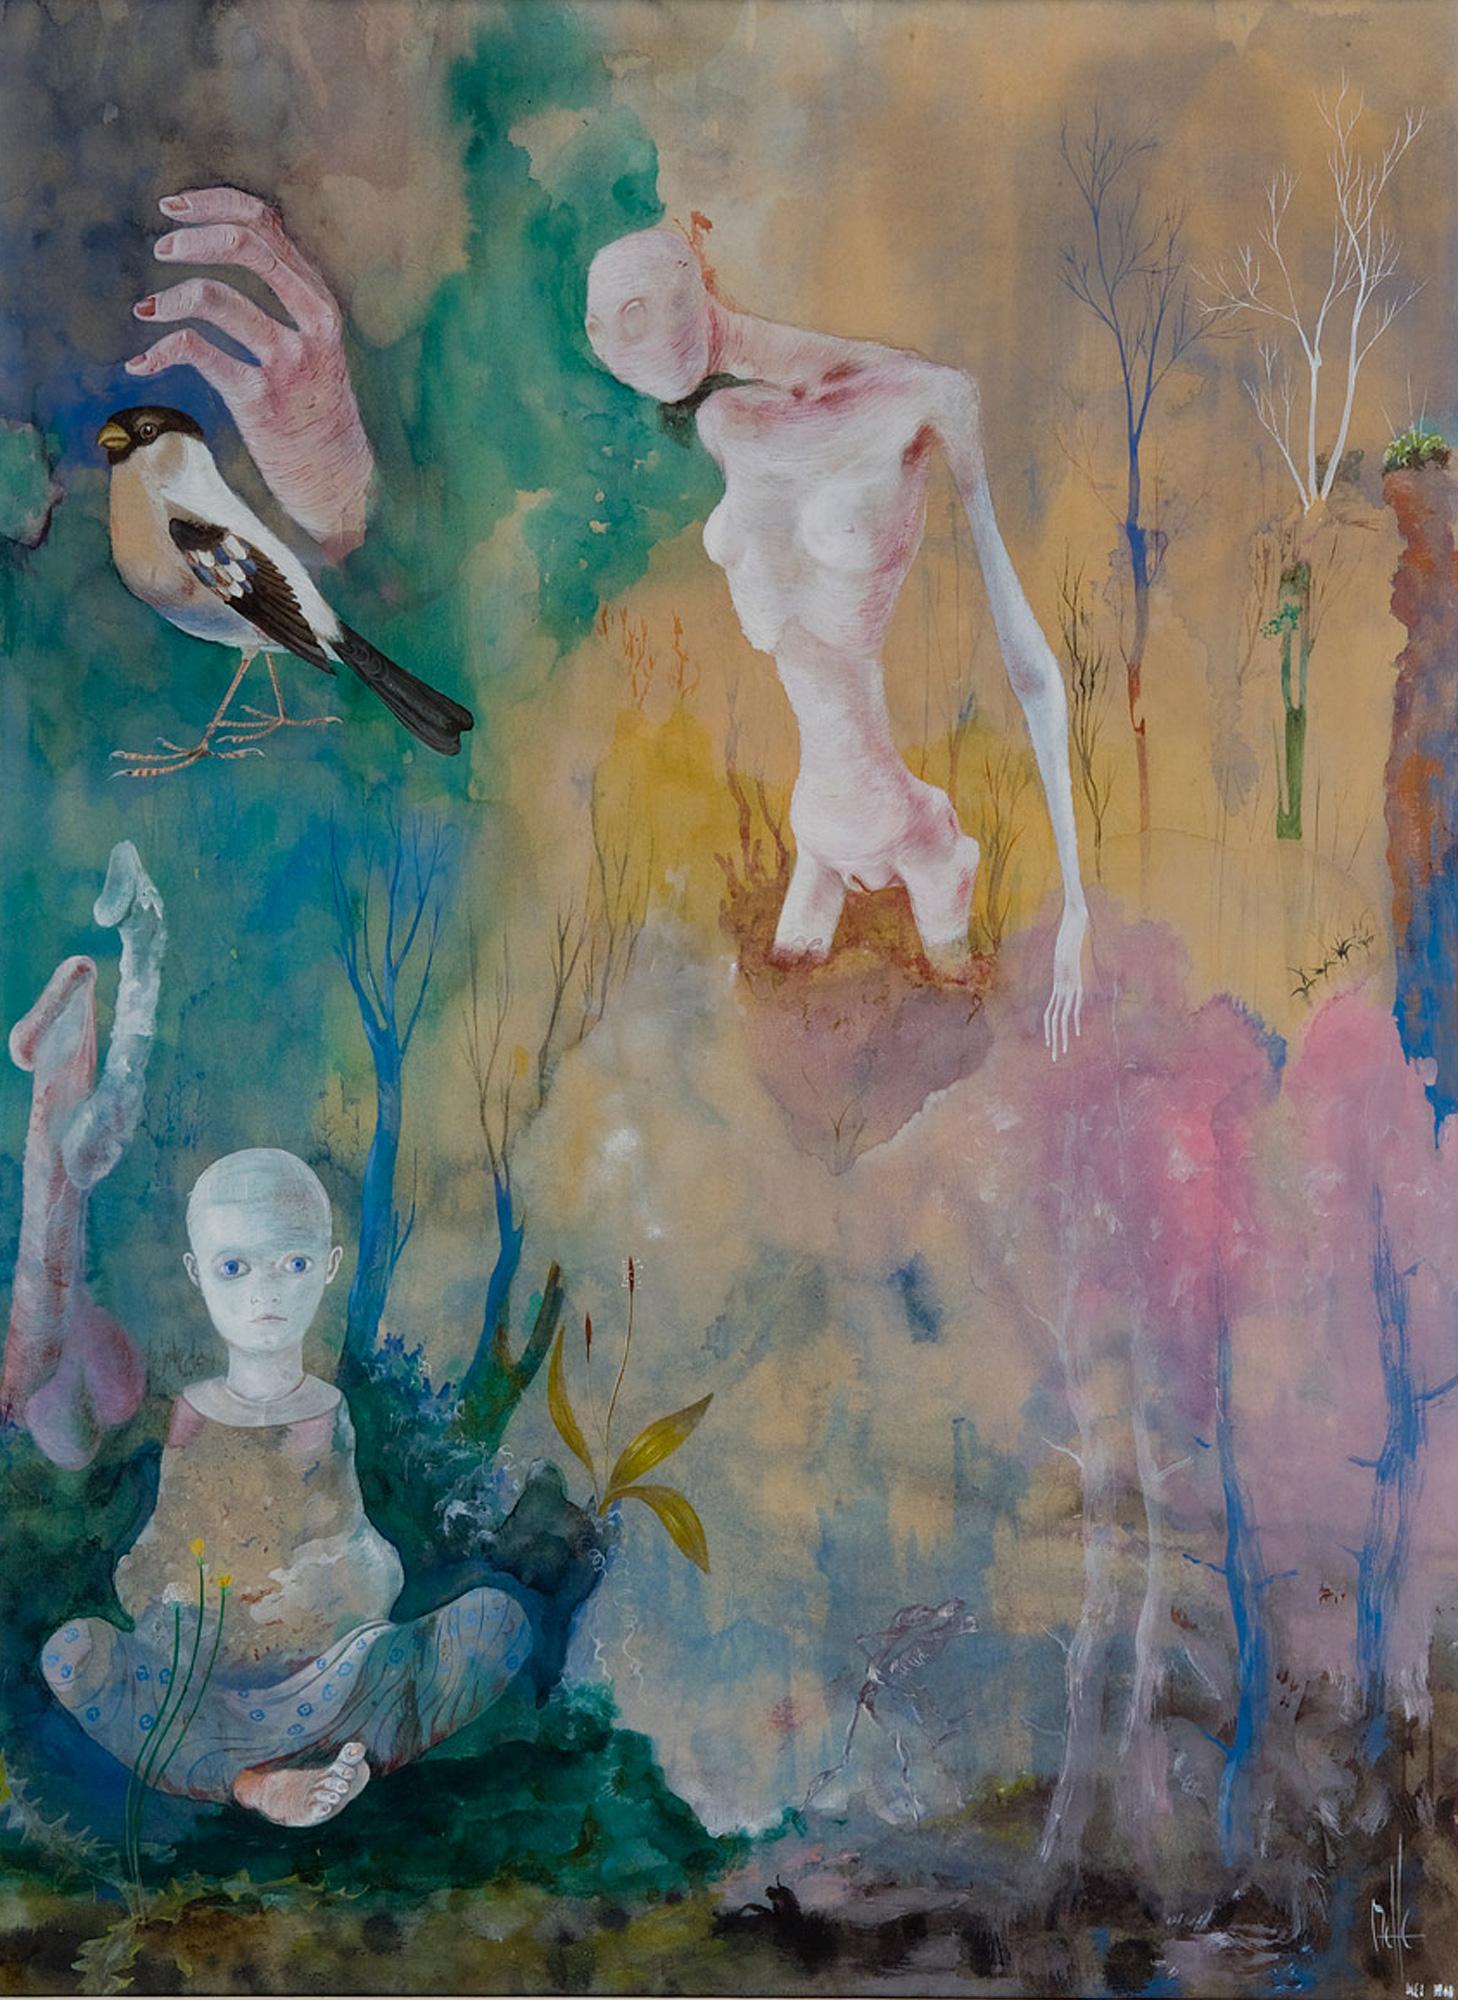 Melle schilder   zonder titel, gouache op papier